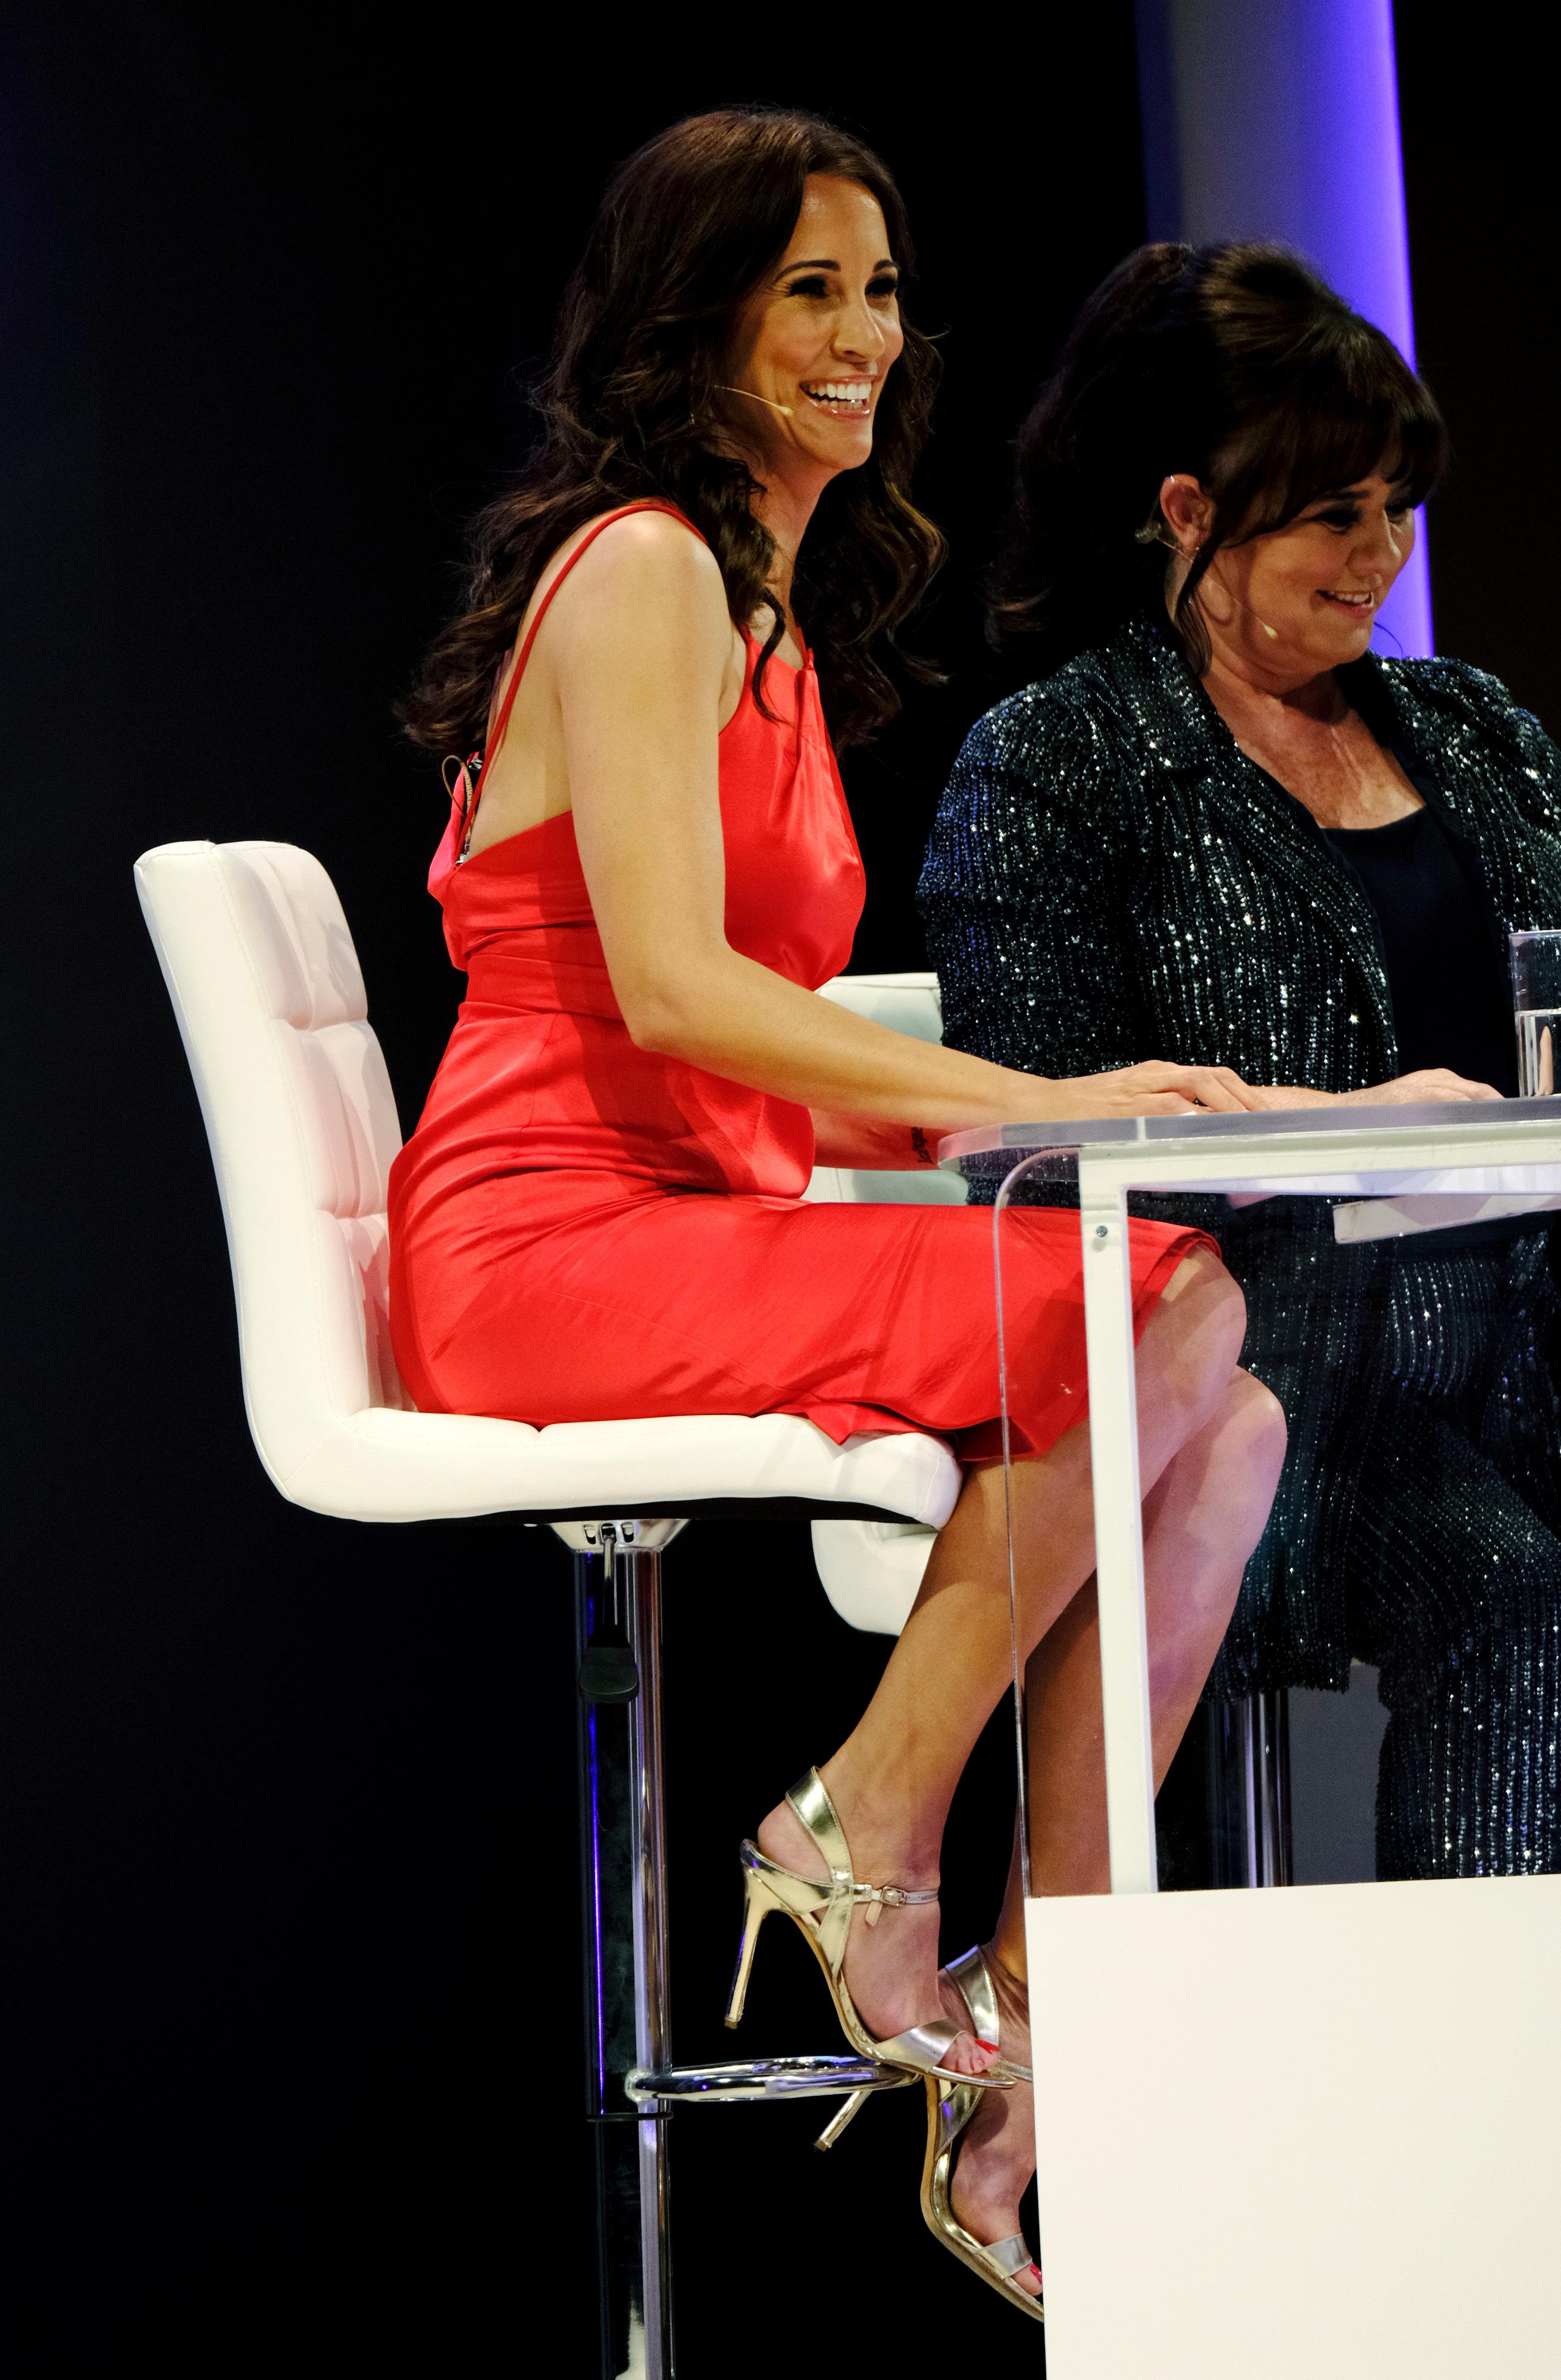 Andrea Mclean Topless andrea mclean's feet << wikifeet